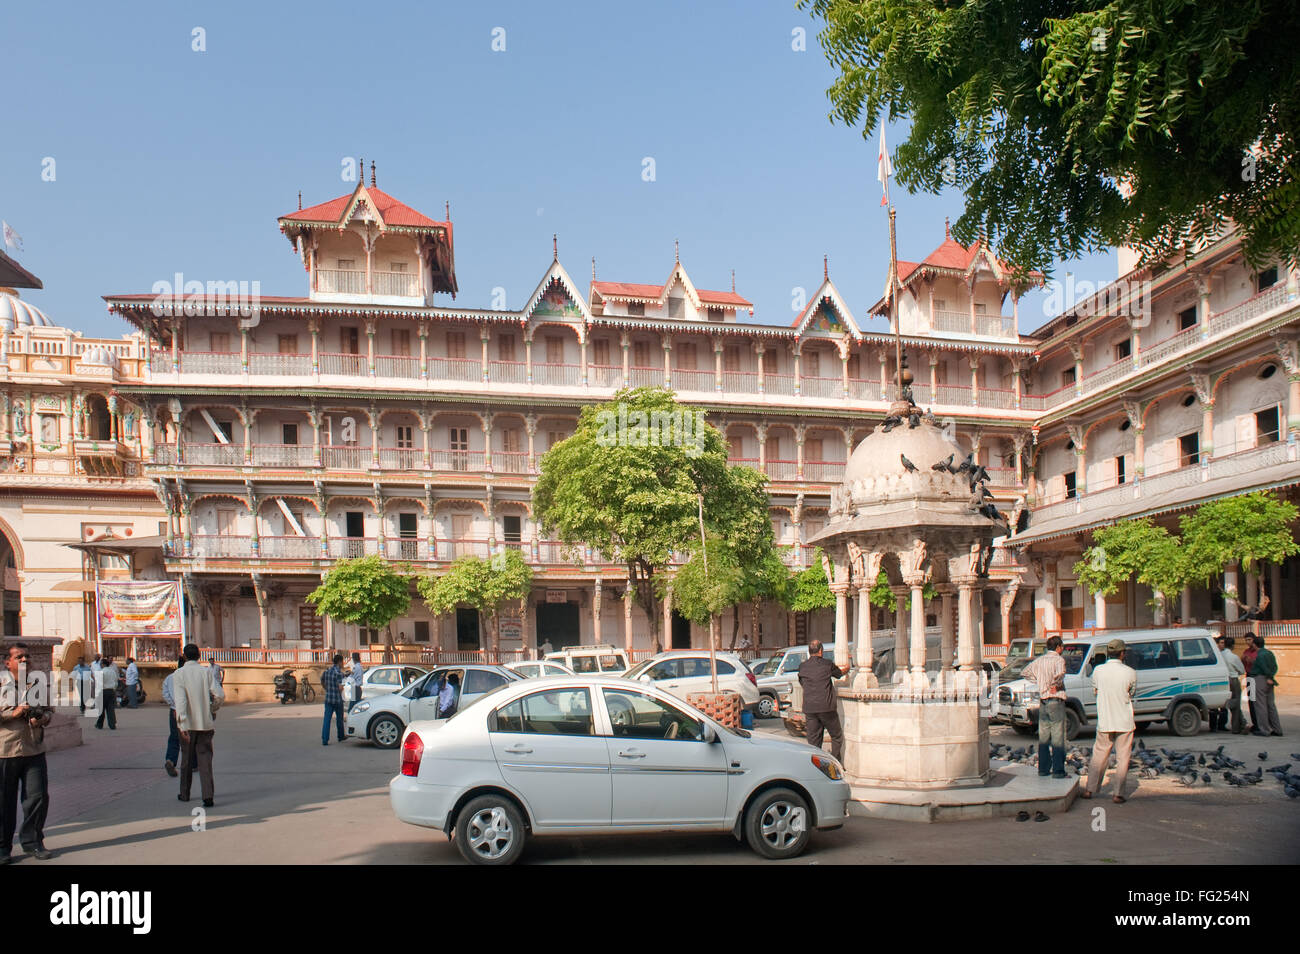 Architecture near swaminarayan temple Ahmedabad Gujarat India - stp 225306 - Stock Image